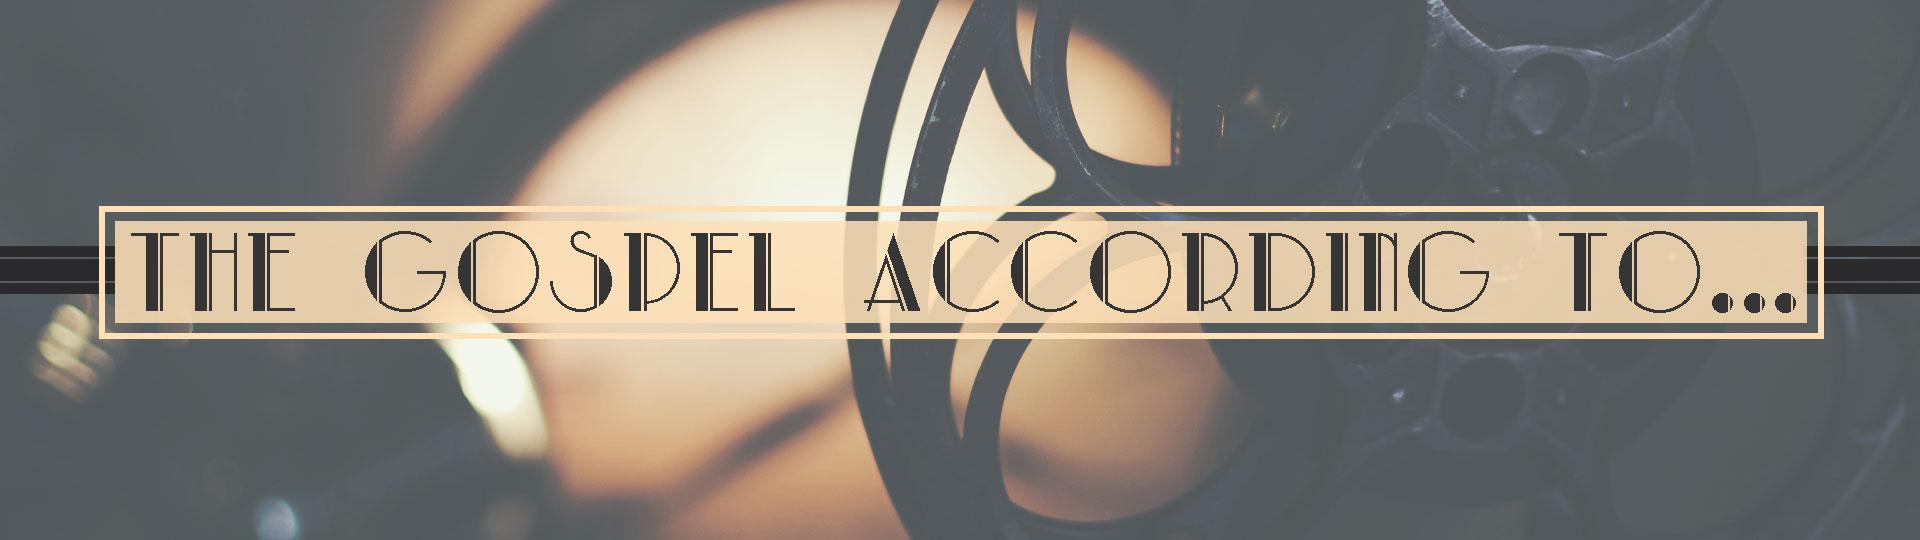 the-gospel-according-to-Blogseries.jpg